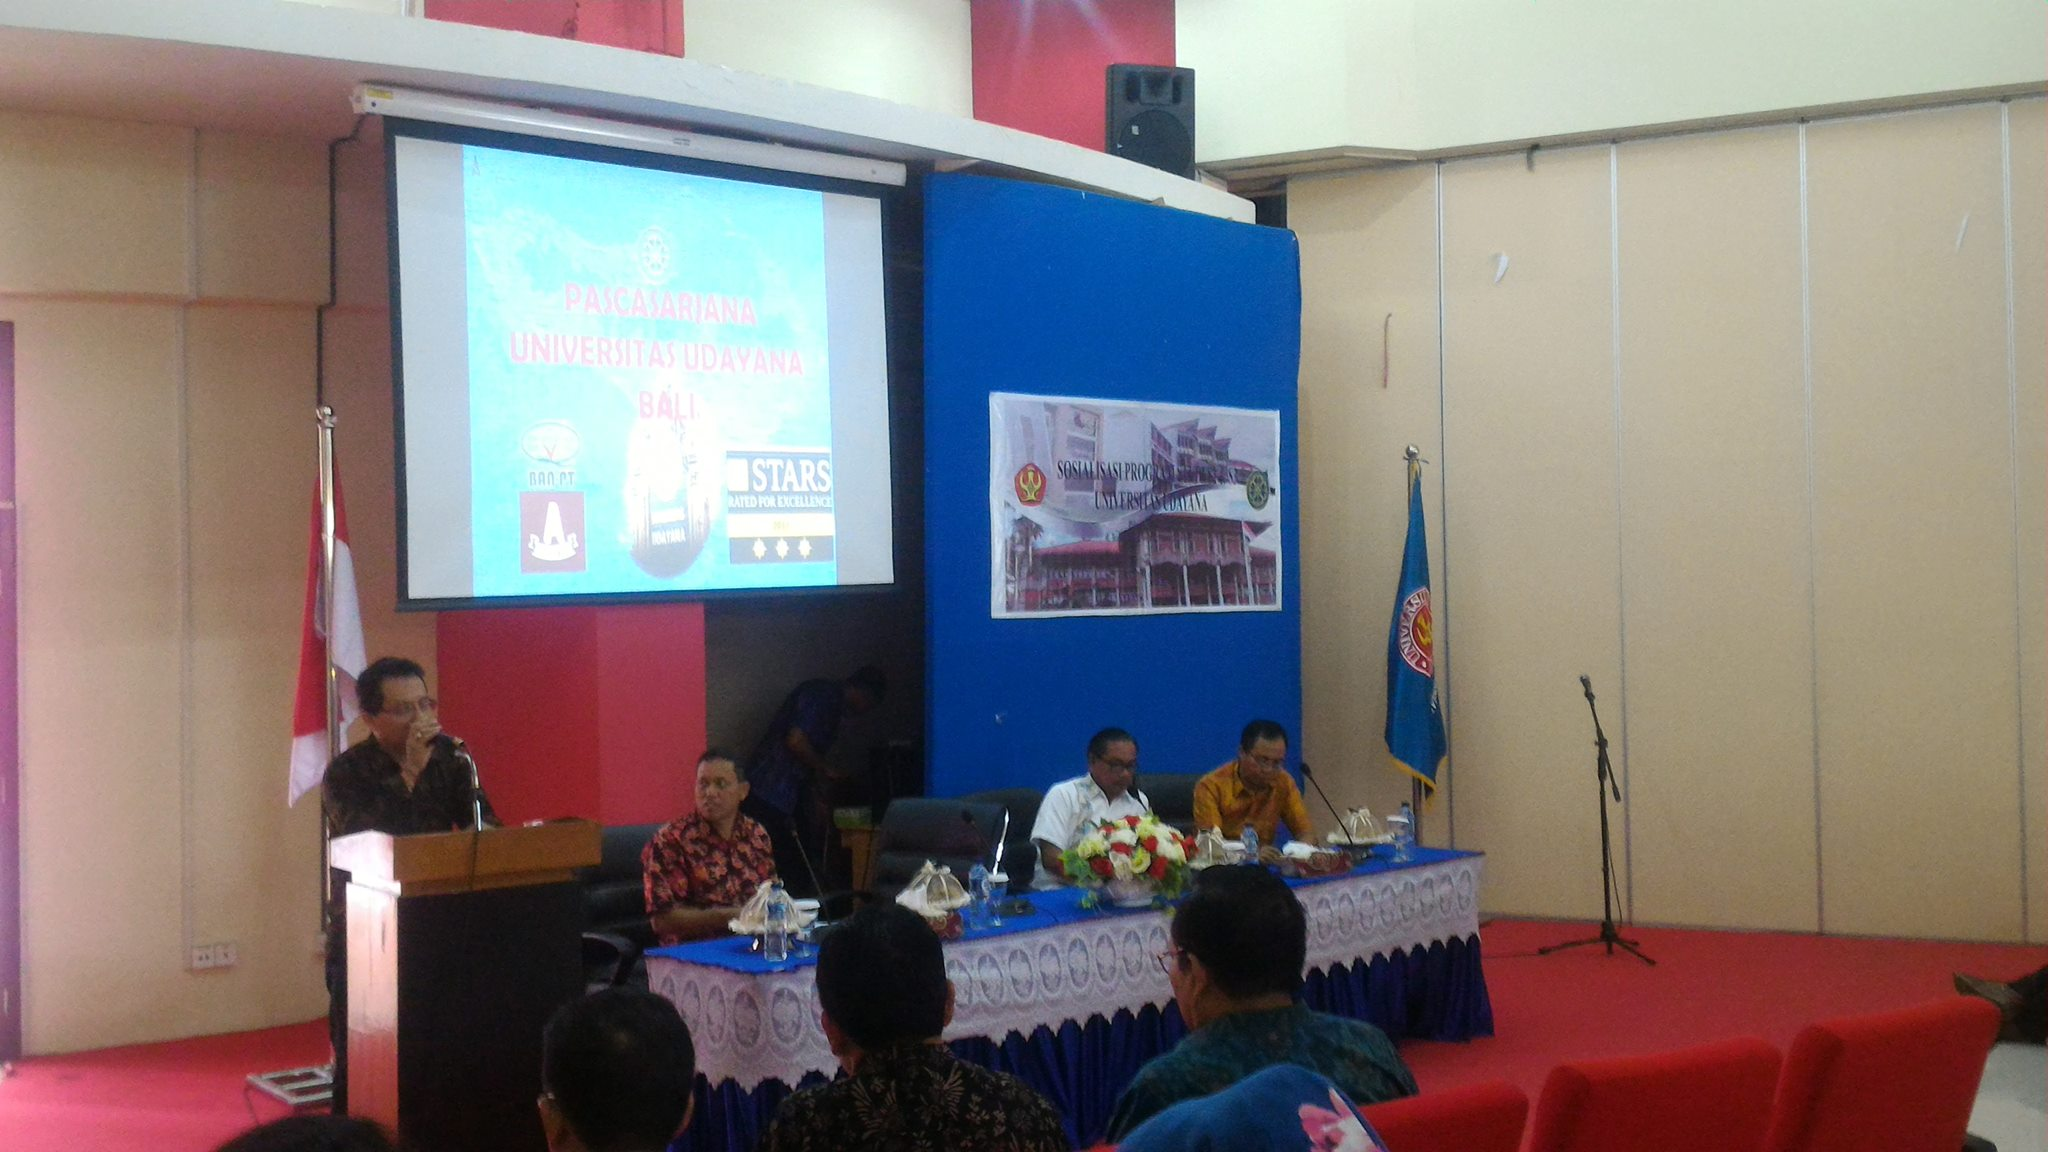 International Office Untad Gelar Sosialisasi Program Pasca Sarjana Universitas Udayana – Bali